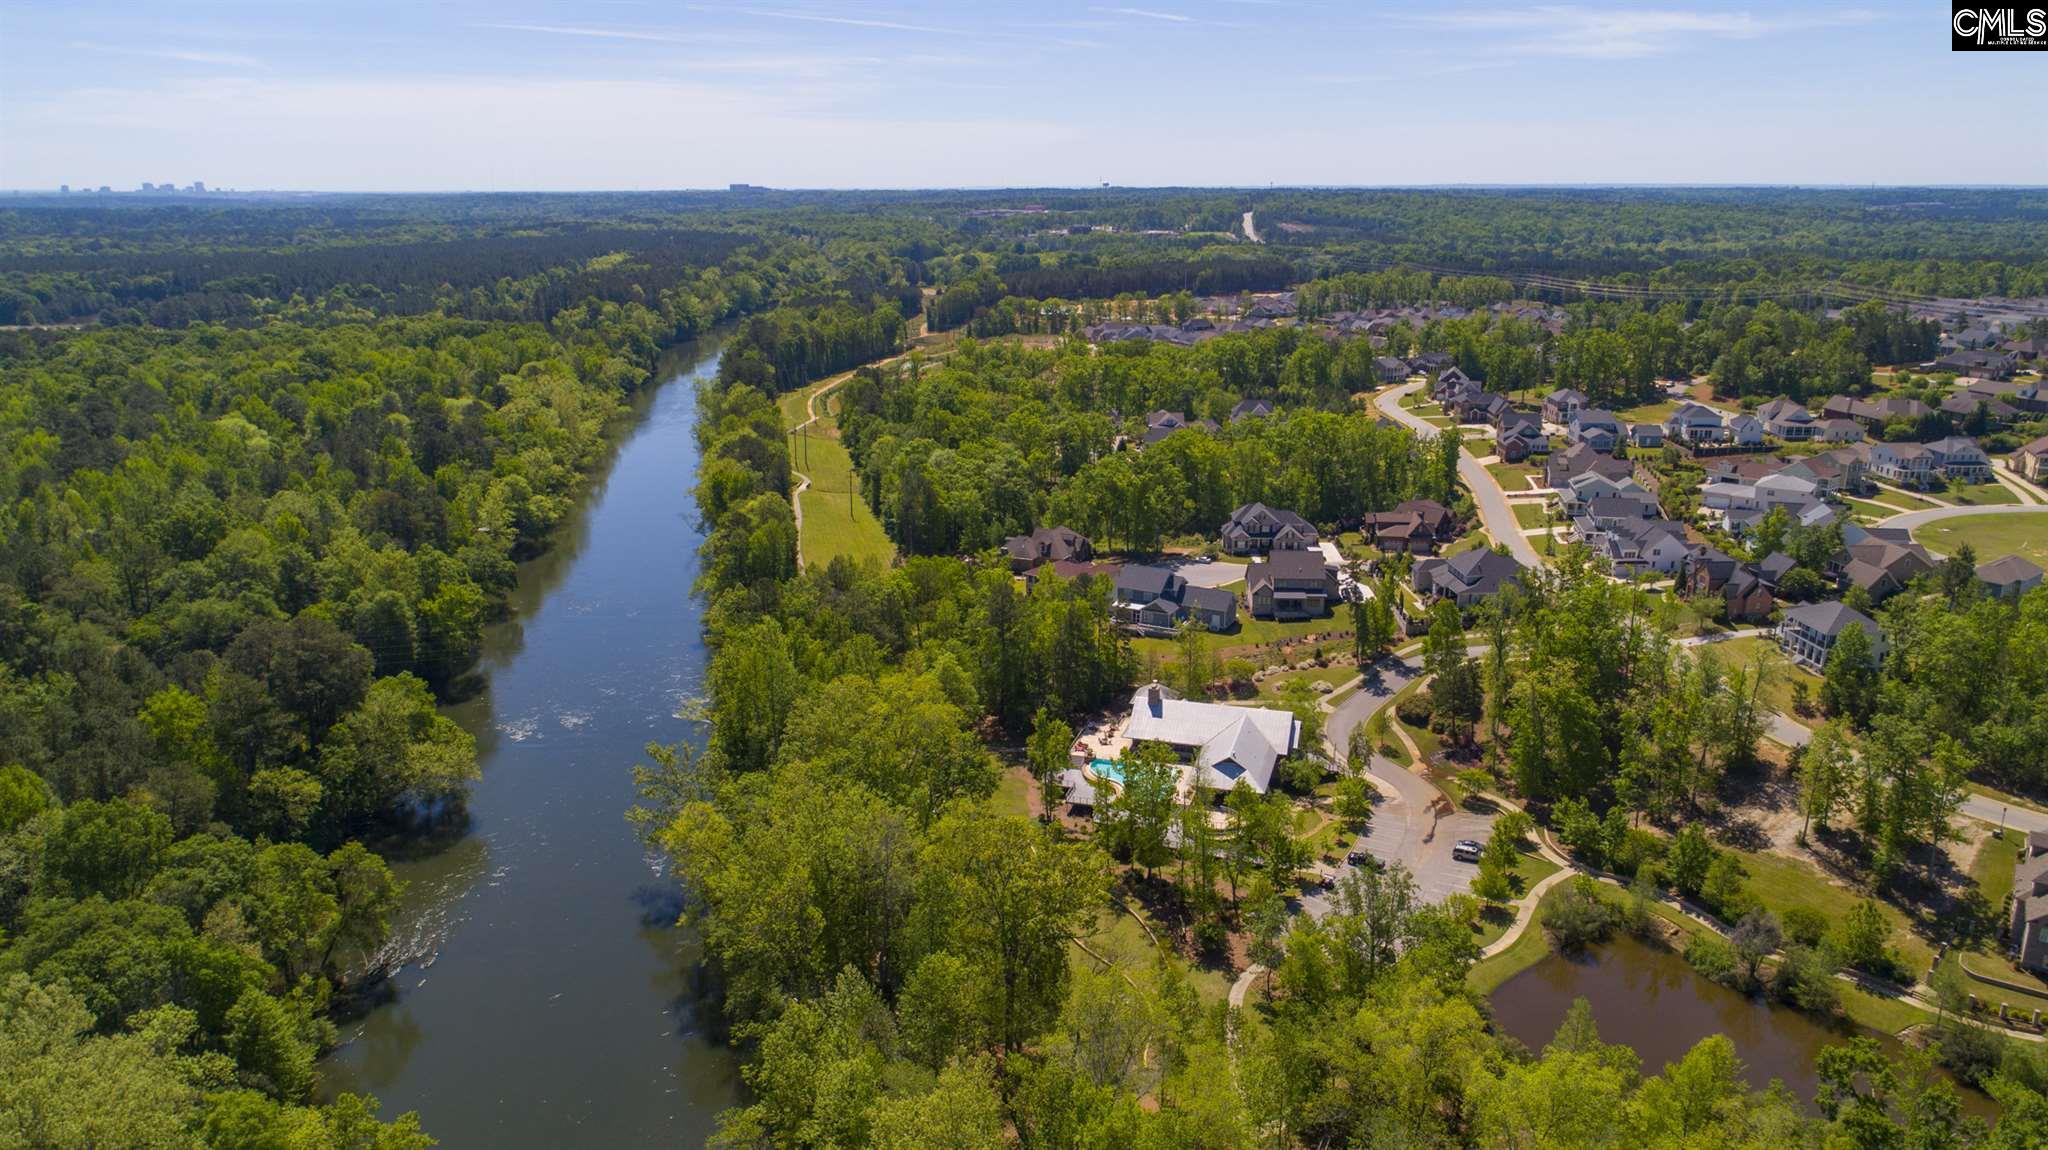 462 River Club Lexington, SC 29072-6721